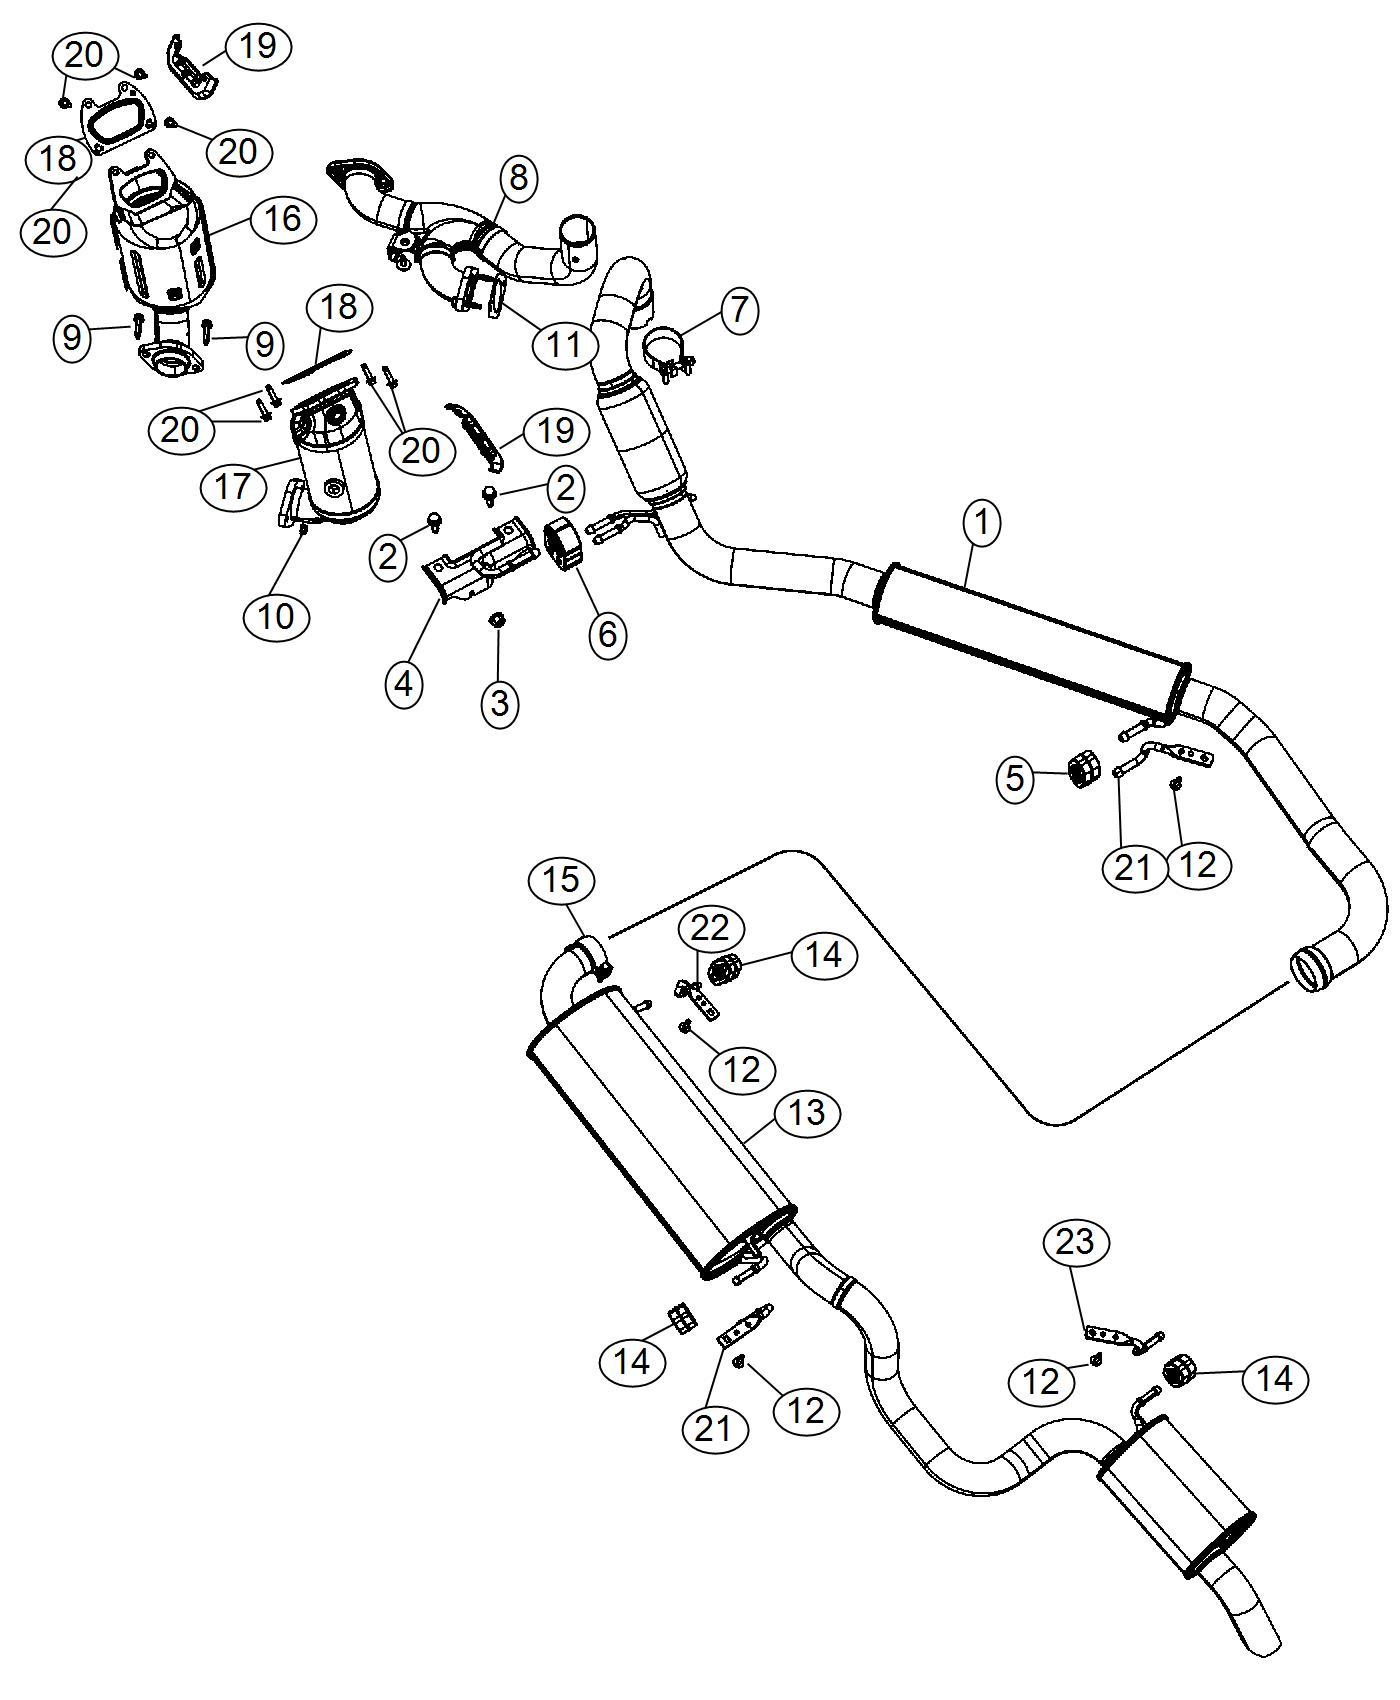 2011 Dodge Grand Caravan Muffler and resonator. Exhaust